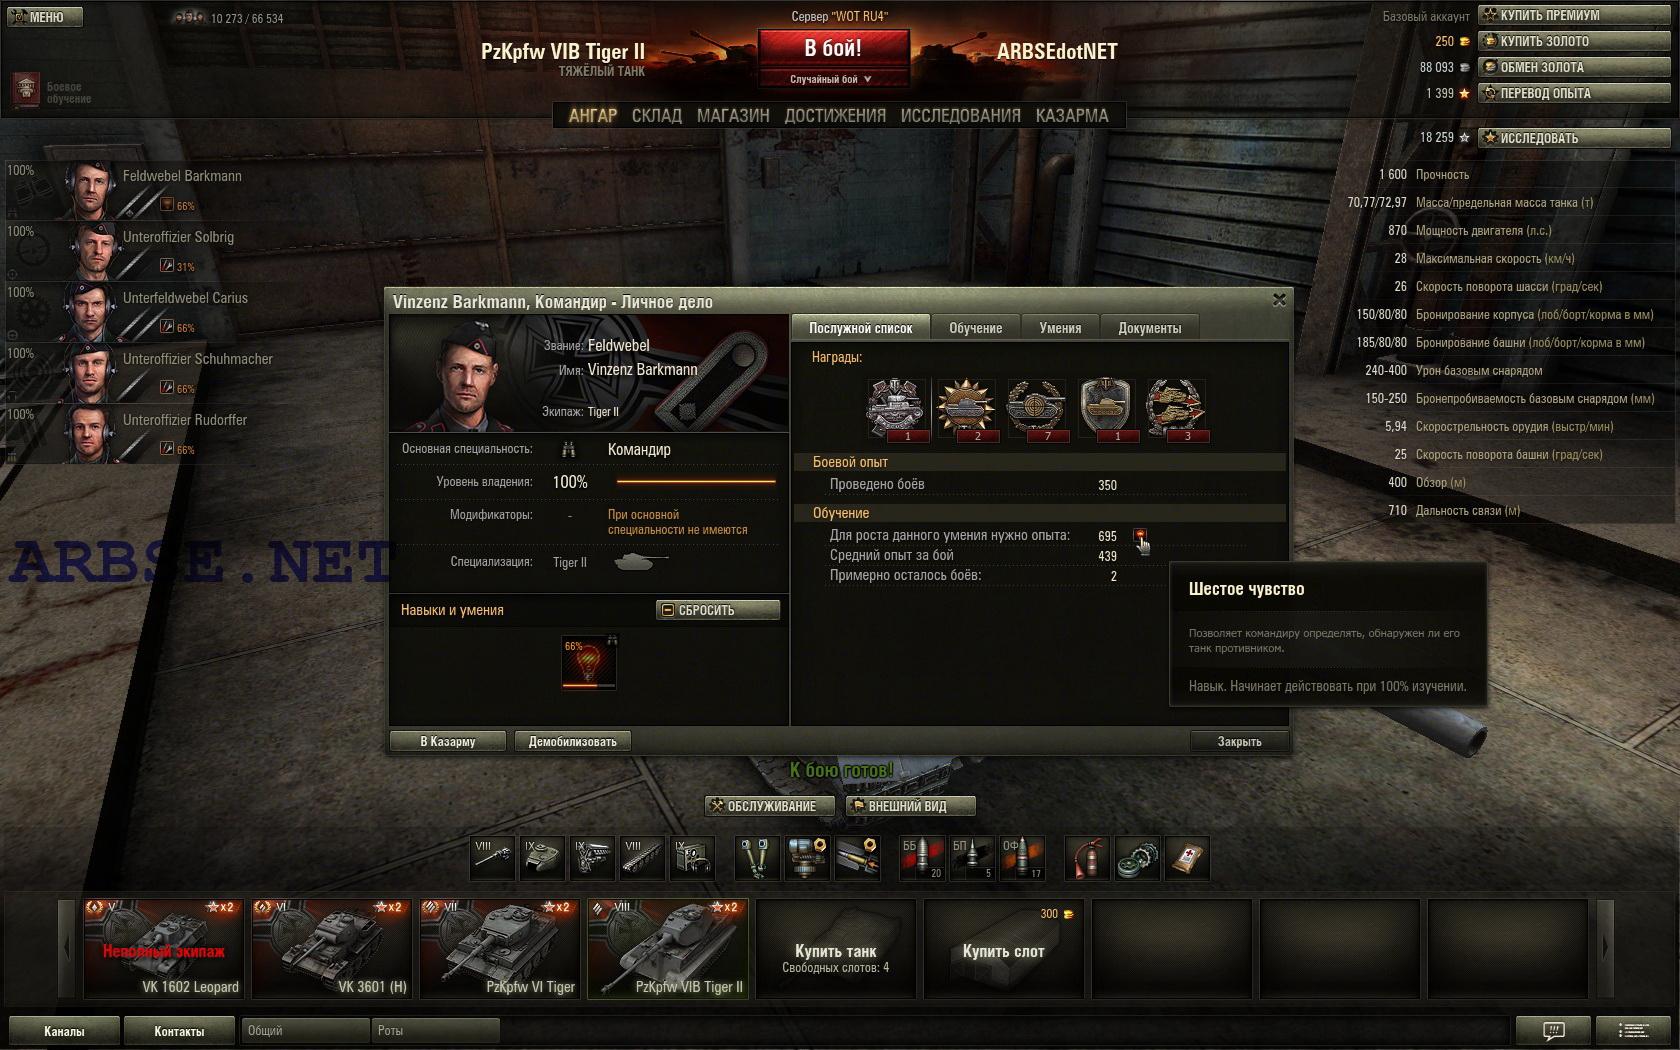 world of tanks na west server ip